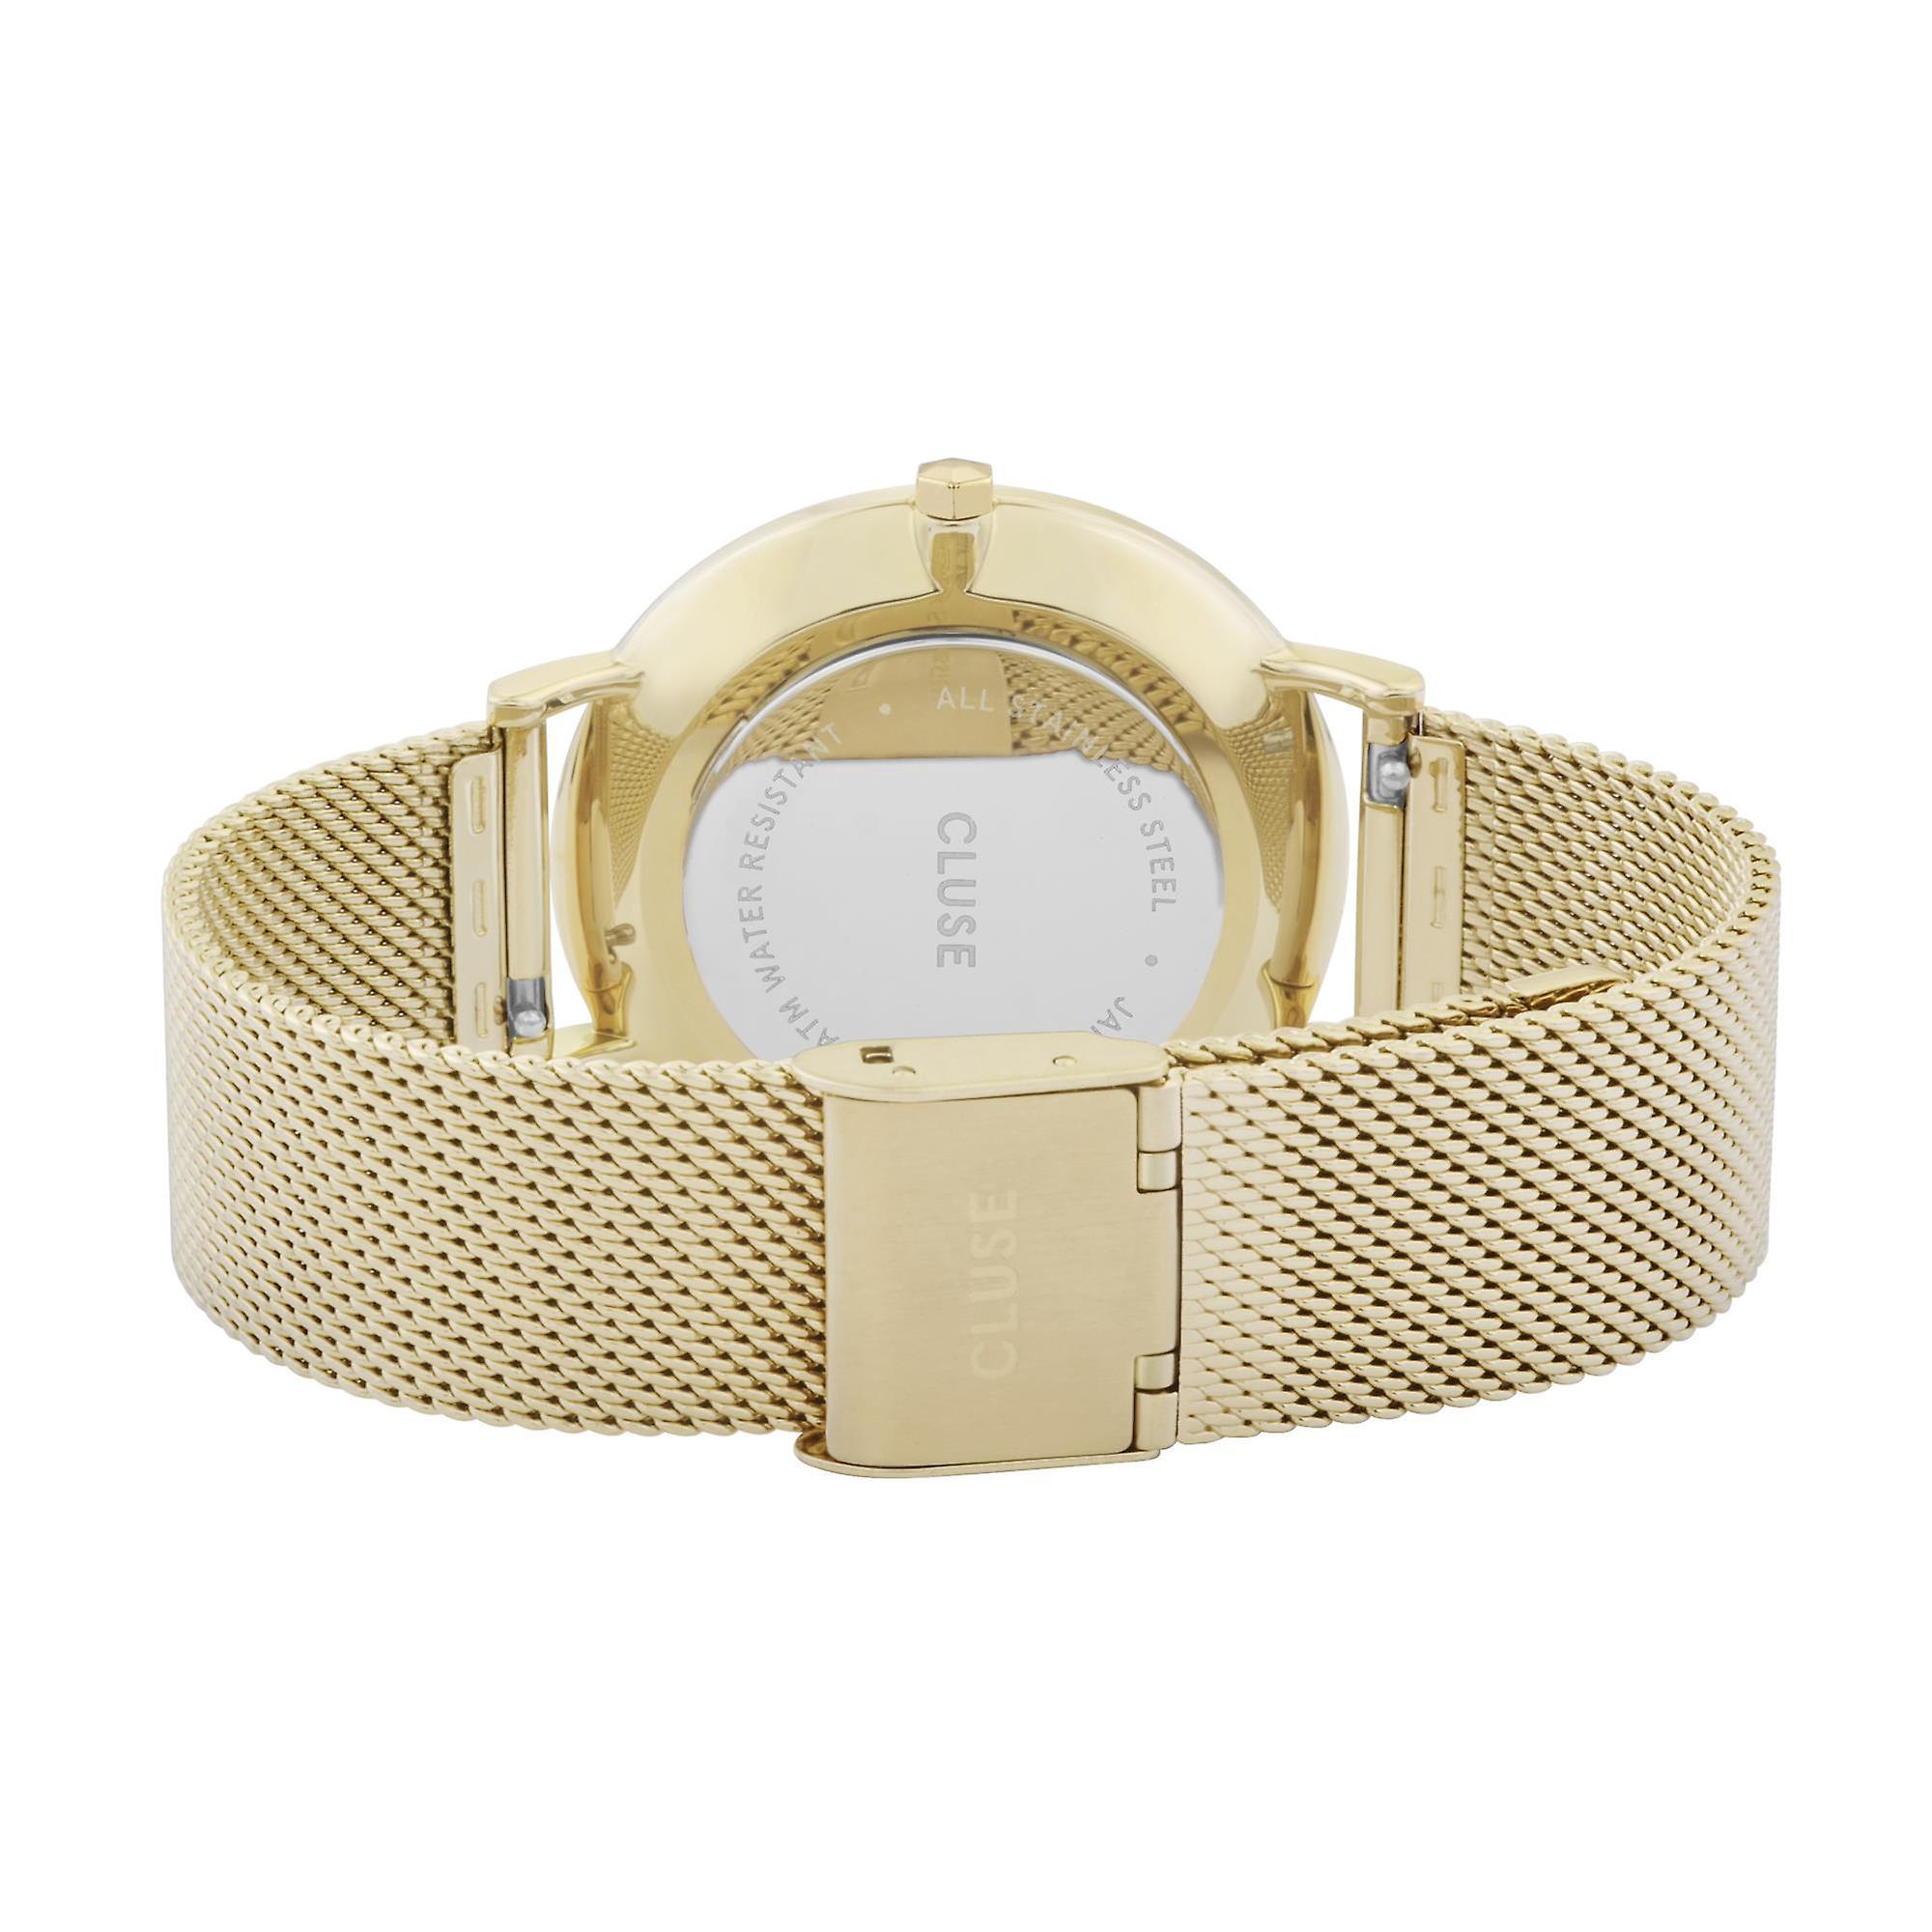 CLUSE La Boheme Gold PVD Stainless Steel White Dial Ladies Watch CW0101201009